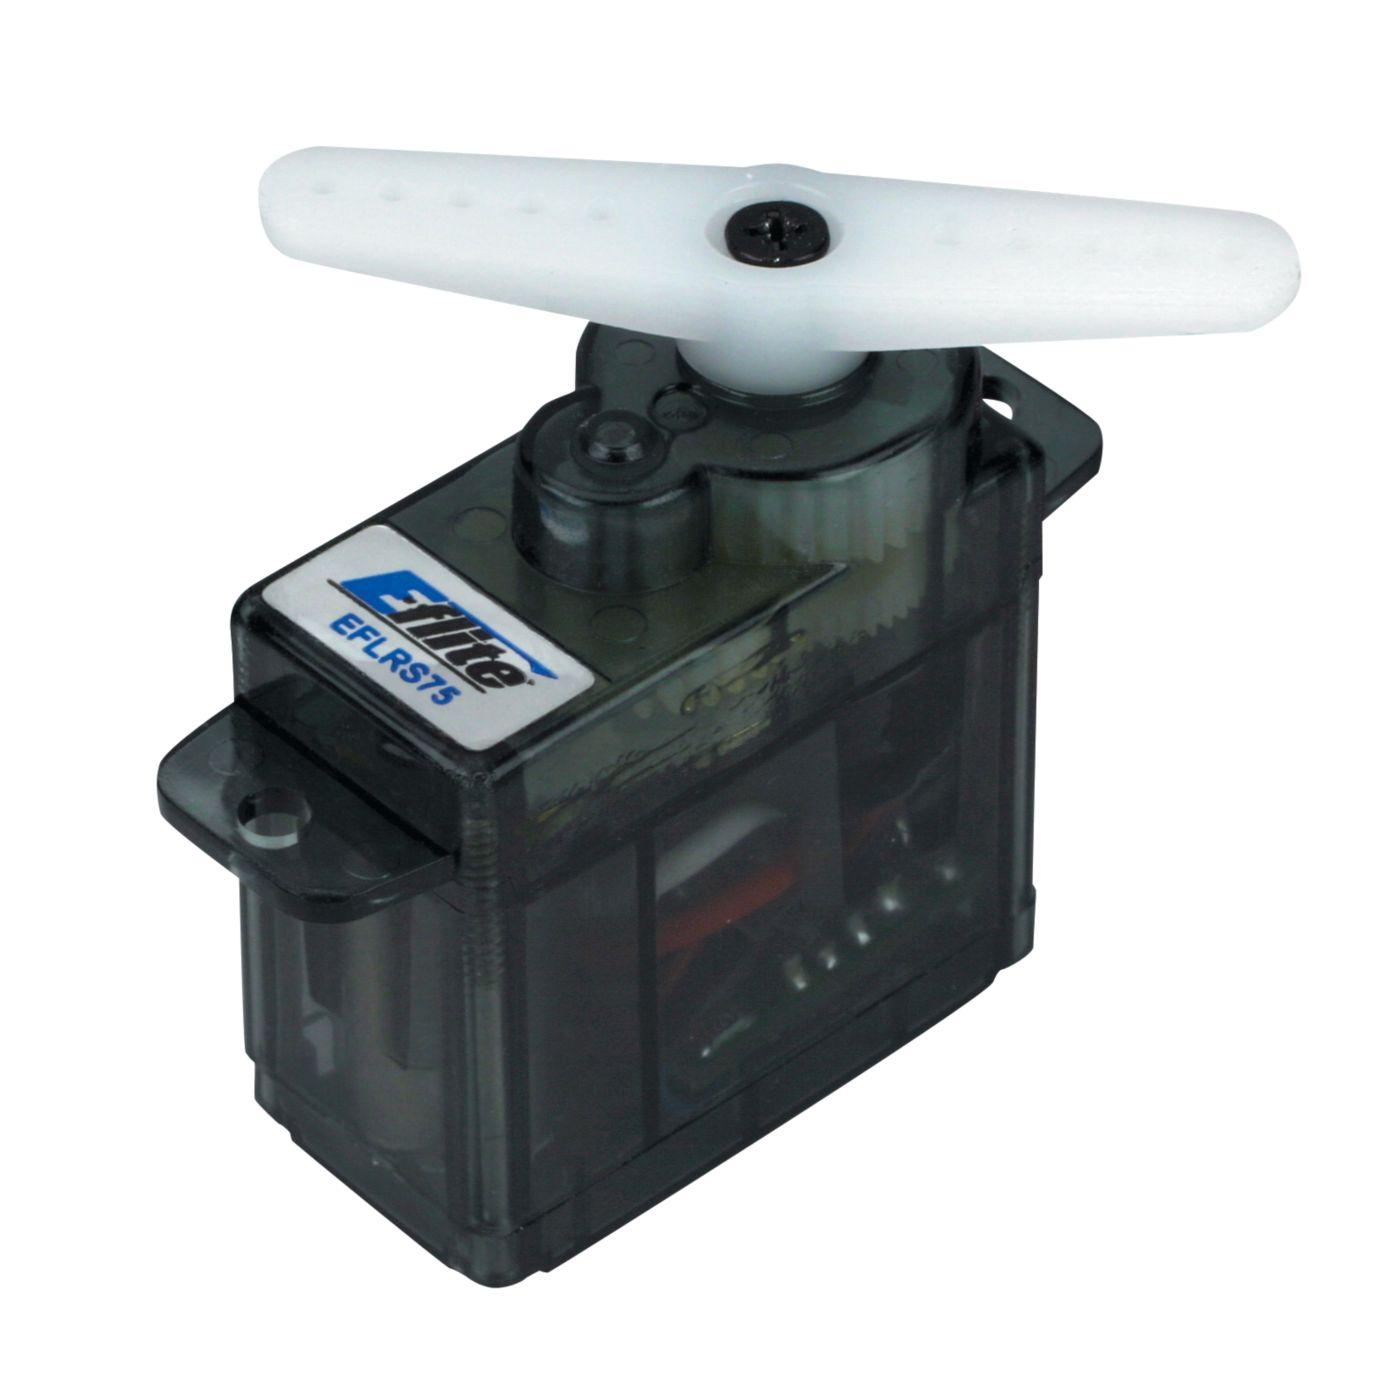 7.5-Gram Sub-Micro S75 Servo  (EFLRS75)